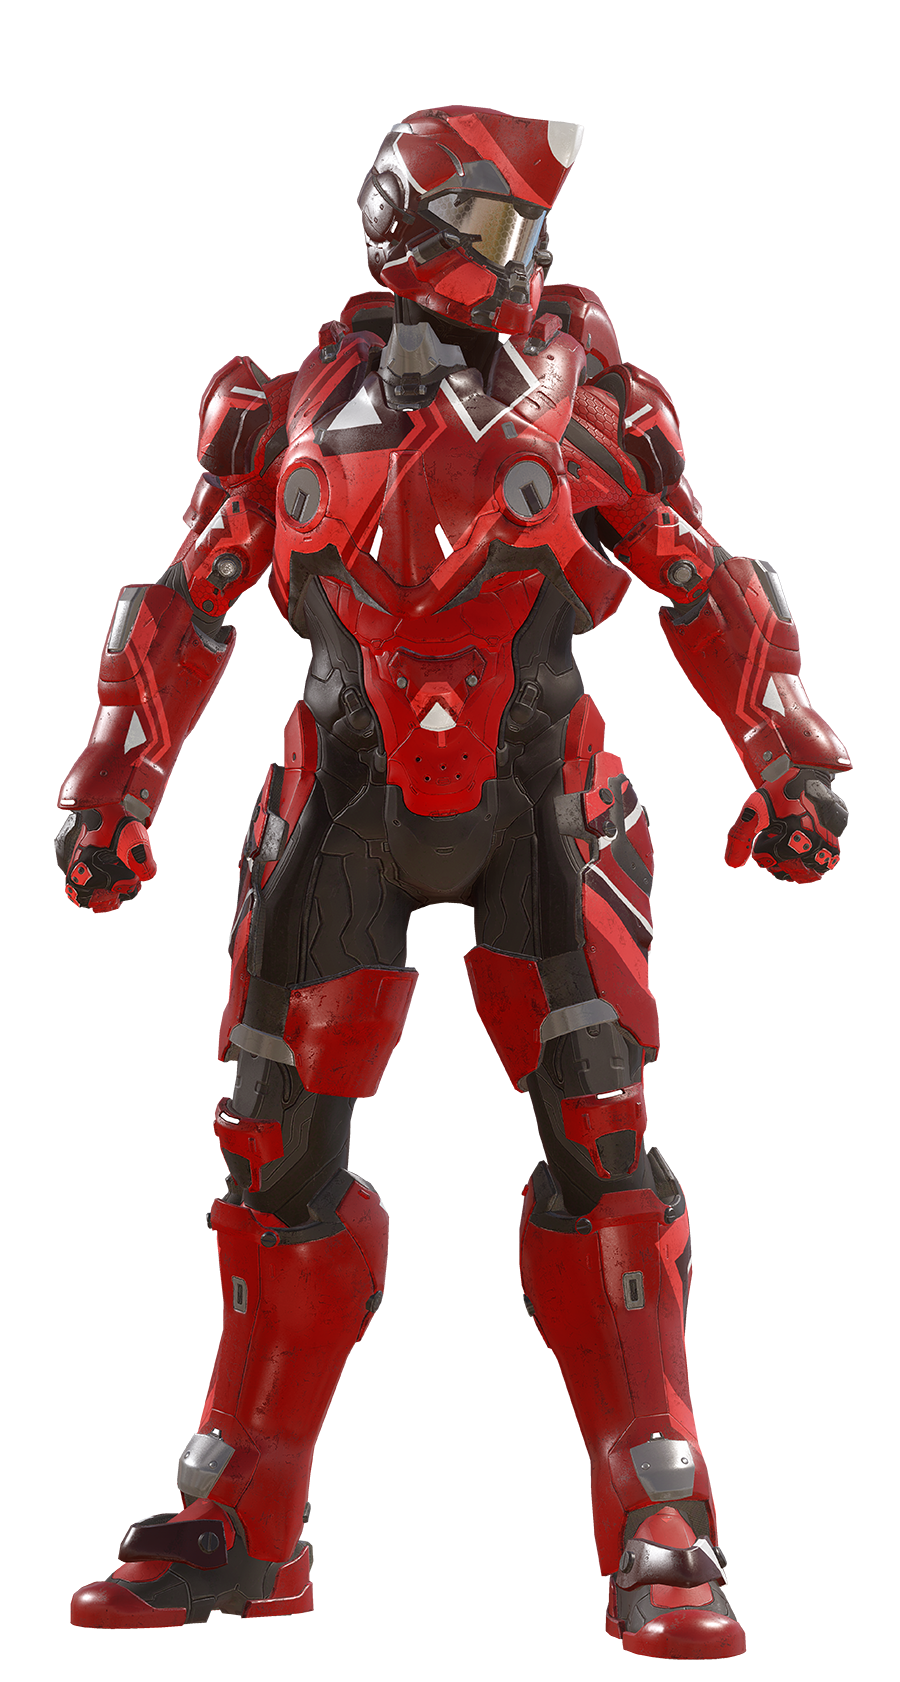 Armadura Potenciada de Asalto MJOLNIR/Variante Jumpmaster